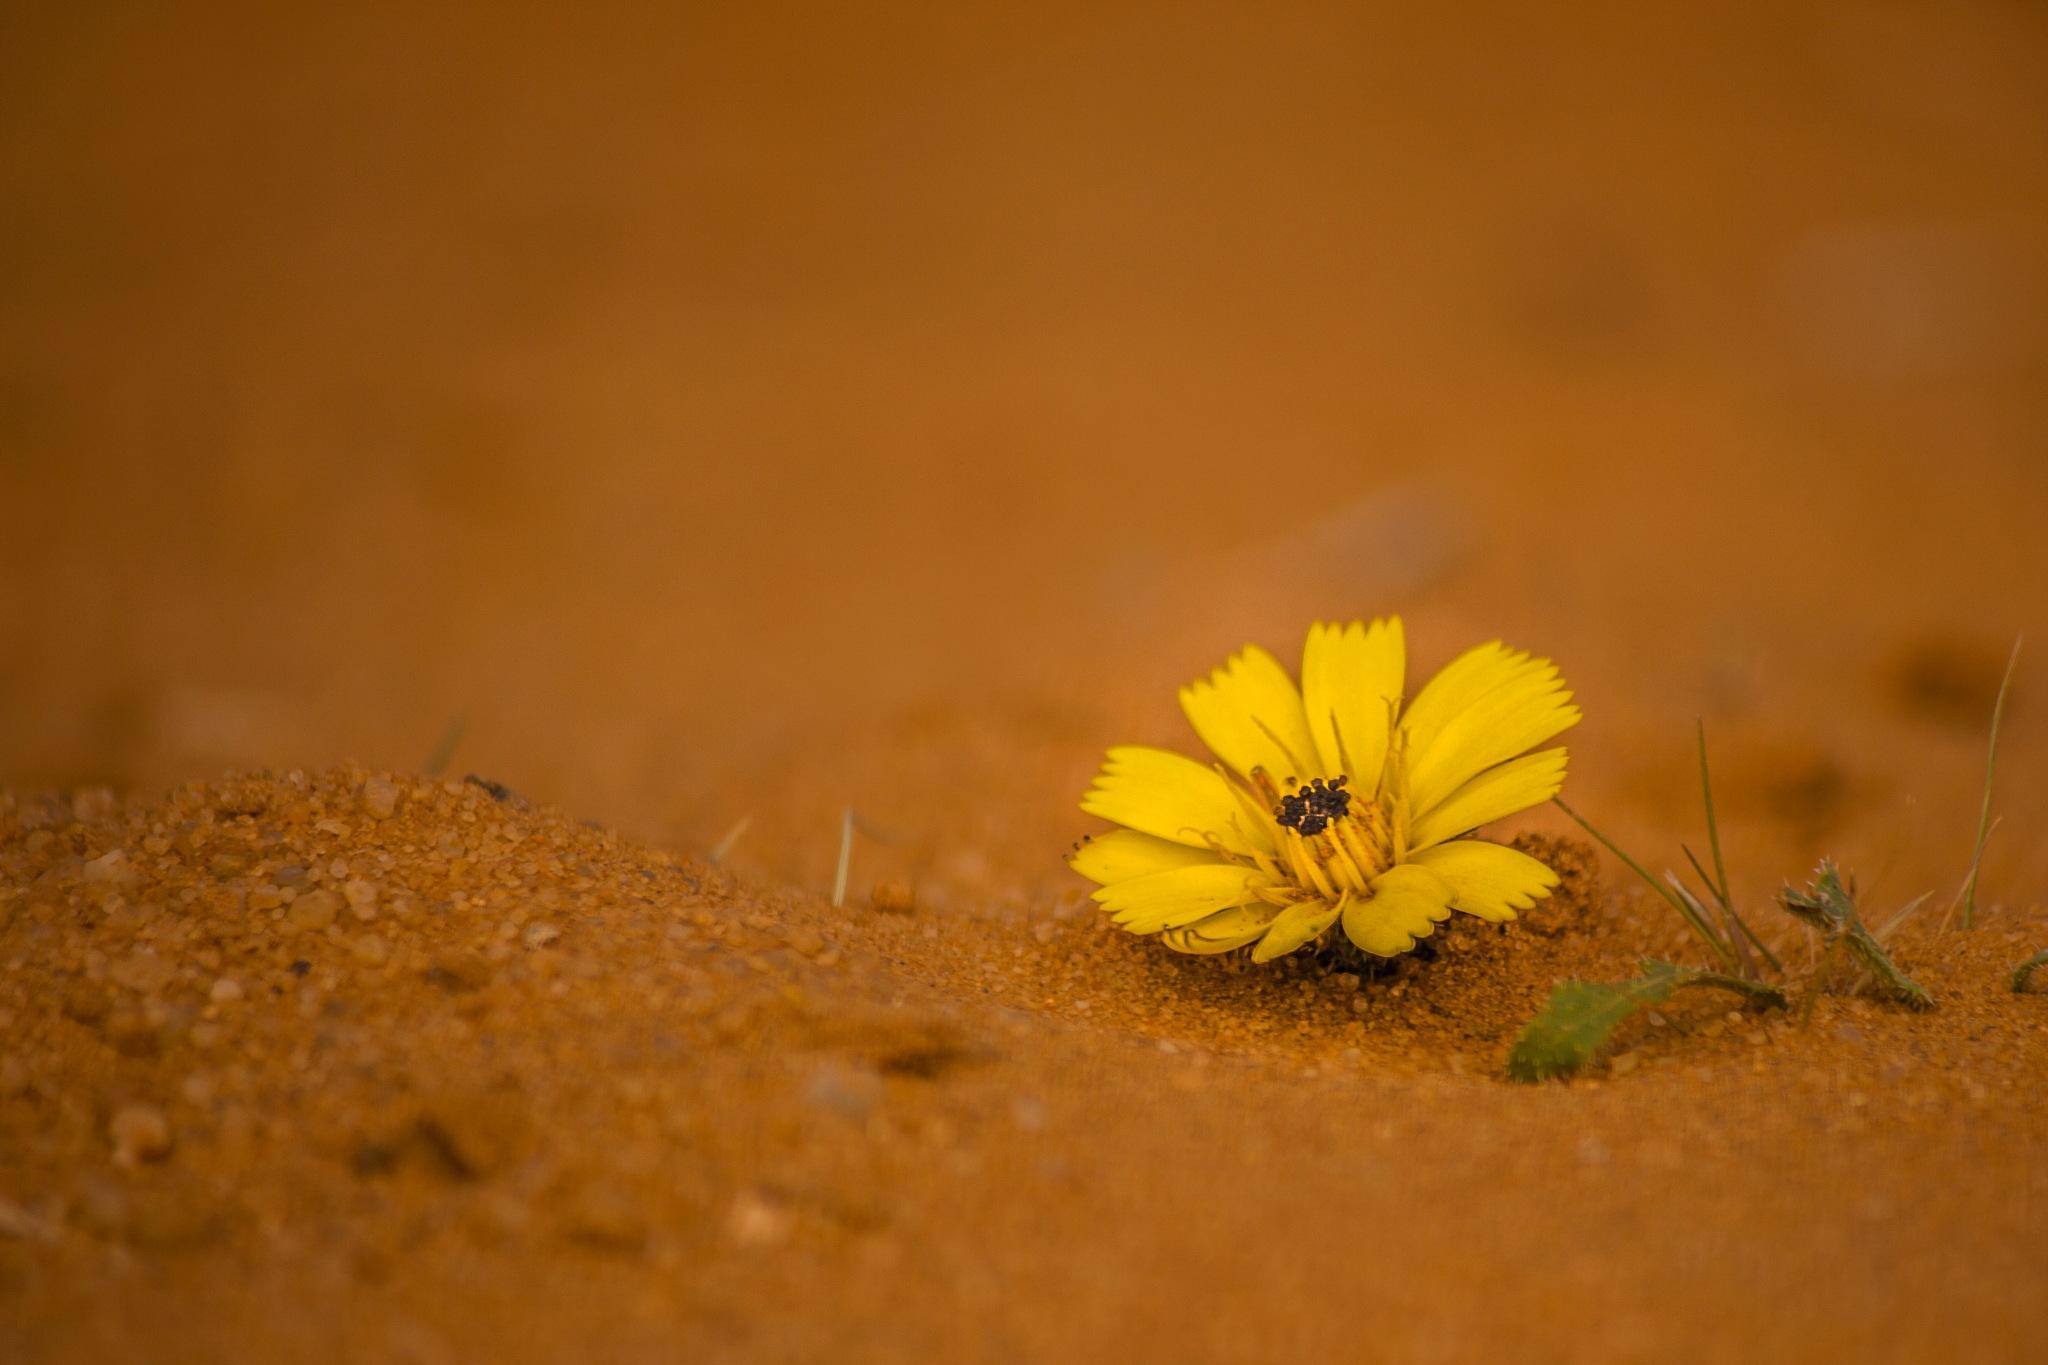 Flower of sand by Abd Salam Sahraoui